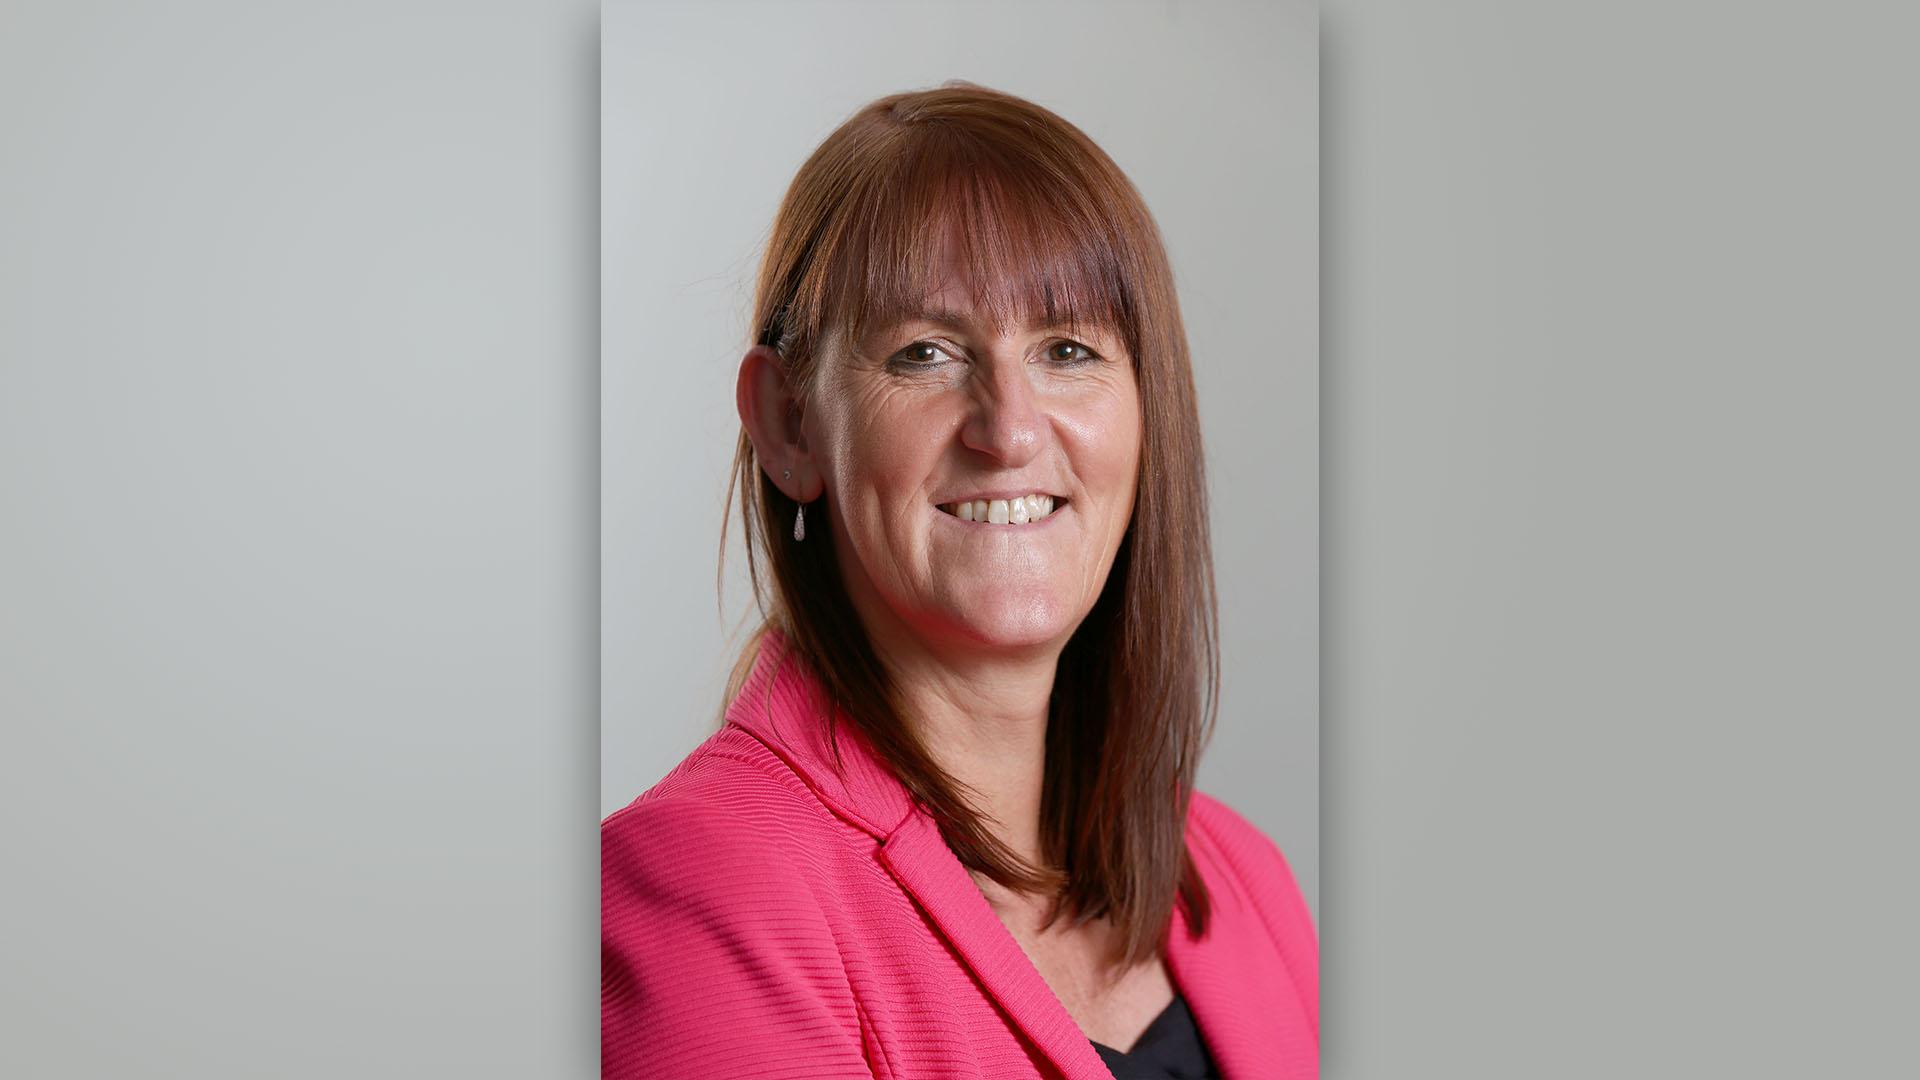 Debbie Mellor, Keighley Laboratories - Career Soundbites